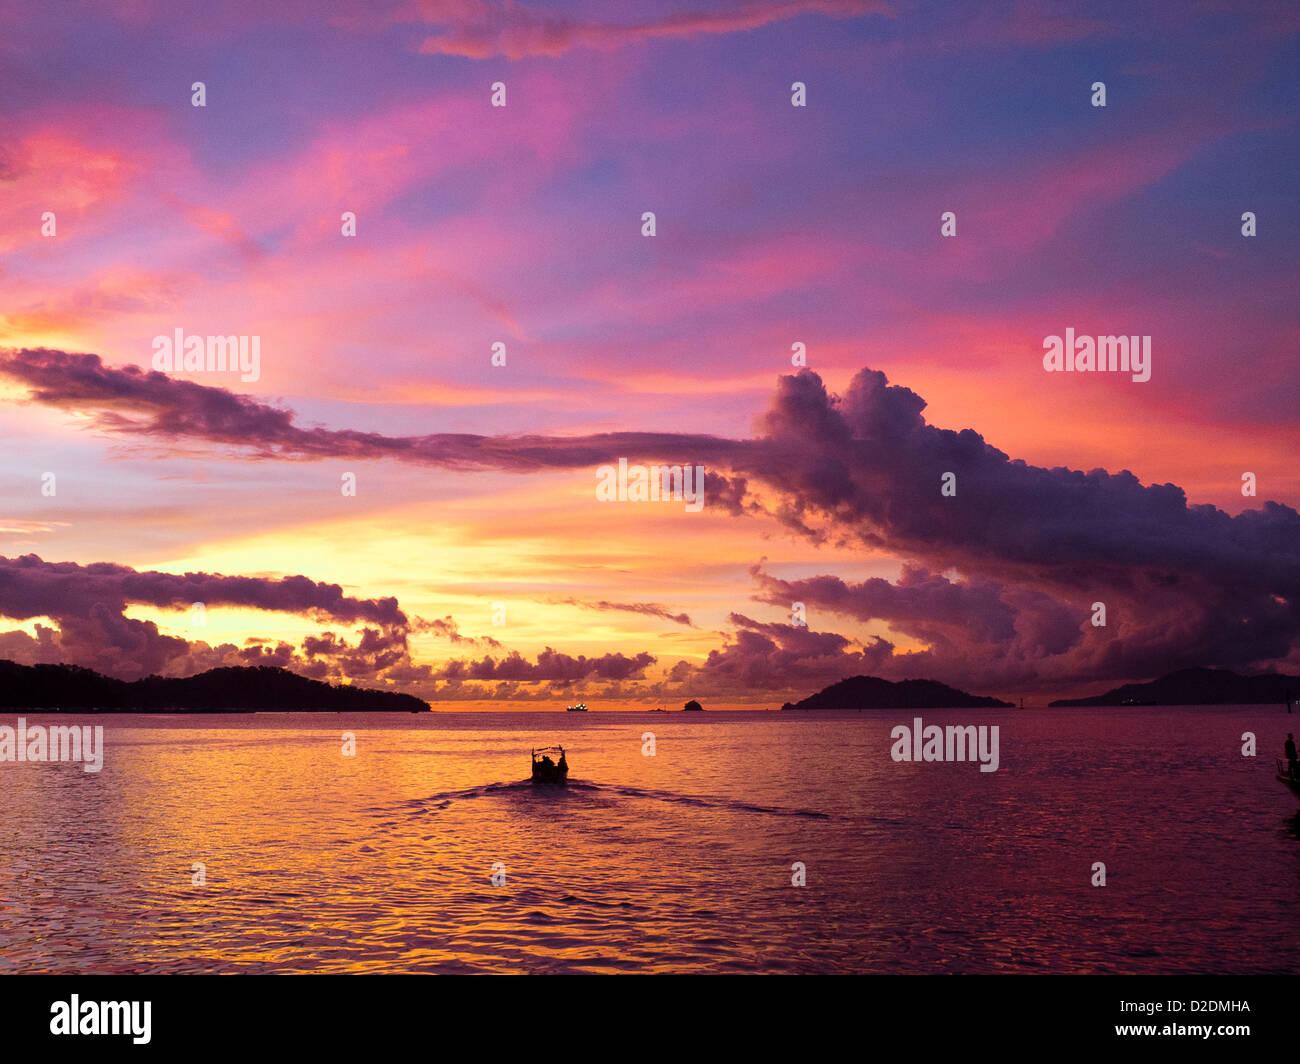 Malaysia, Borneo, Kota Kinabalu, South China Sea at dusk Stock Photo